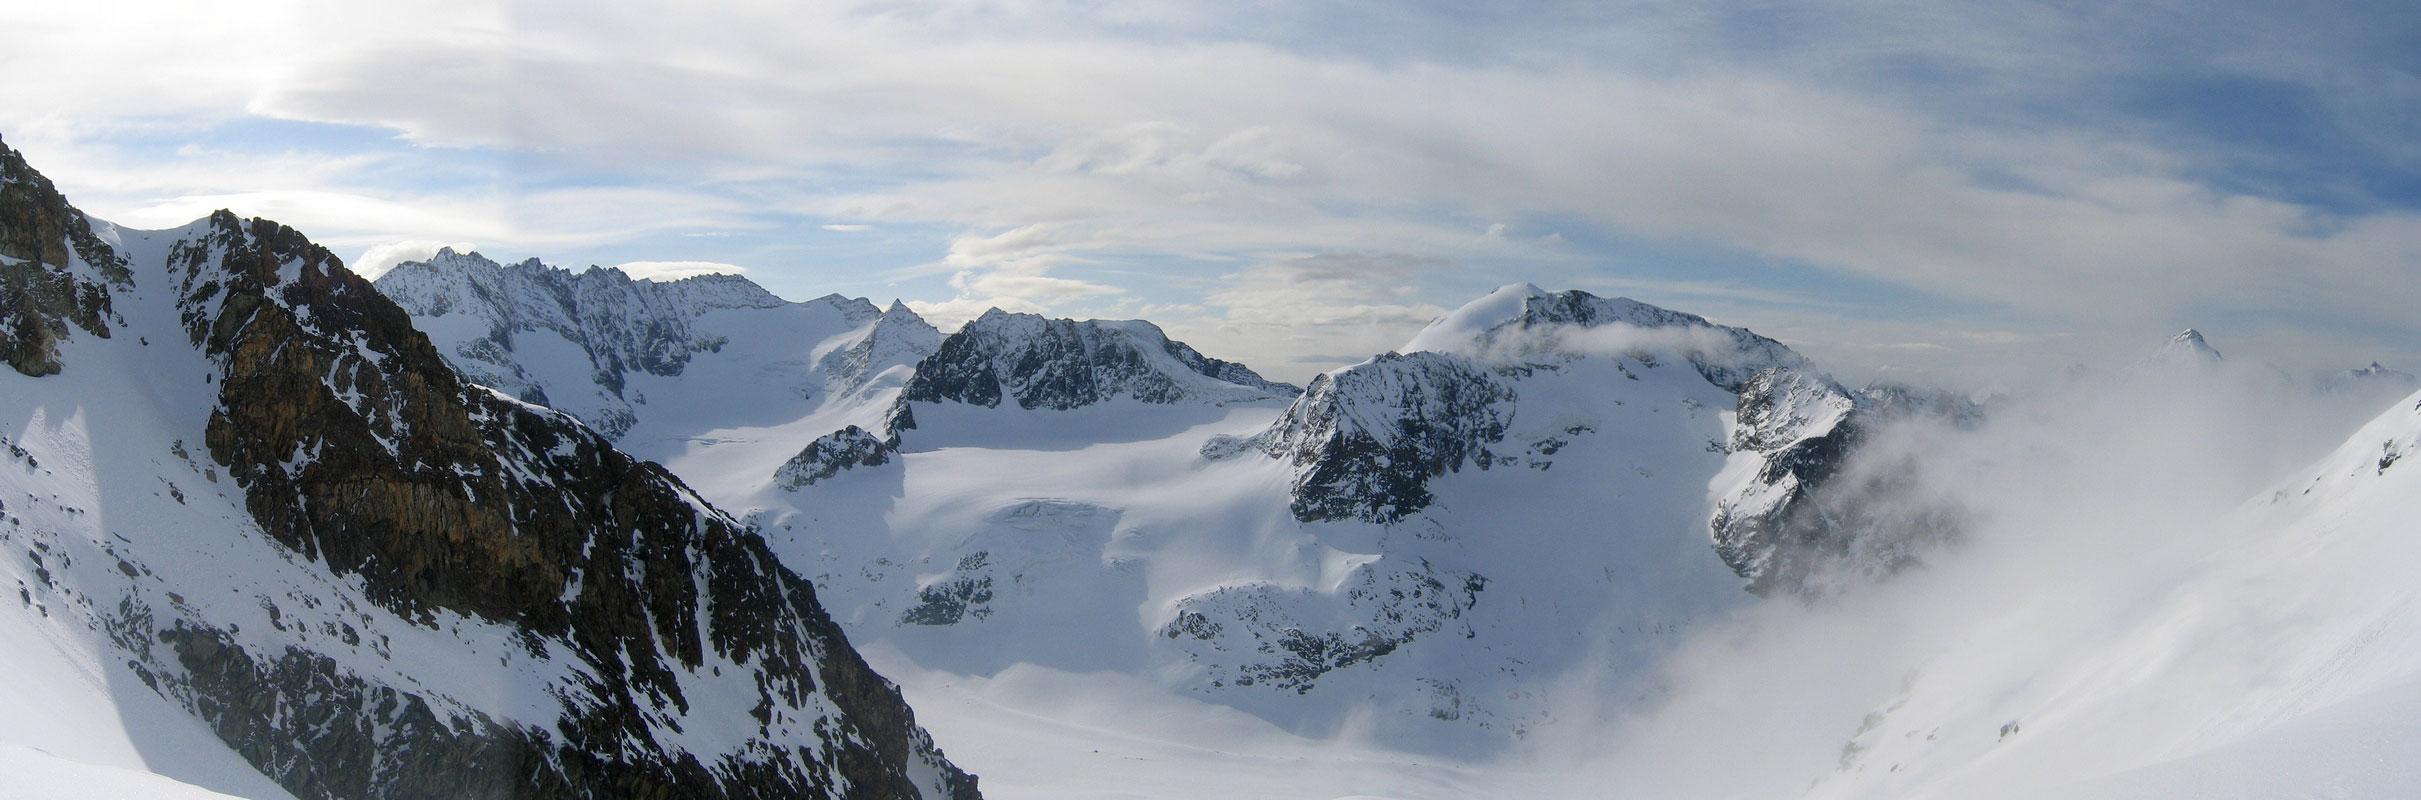 Pigne Arolla, Day 5 H.R. Chamonix-Zermatt Walliser Alpen / Alpes valaisannes Švýcarsko panorama 50